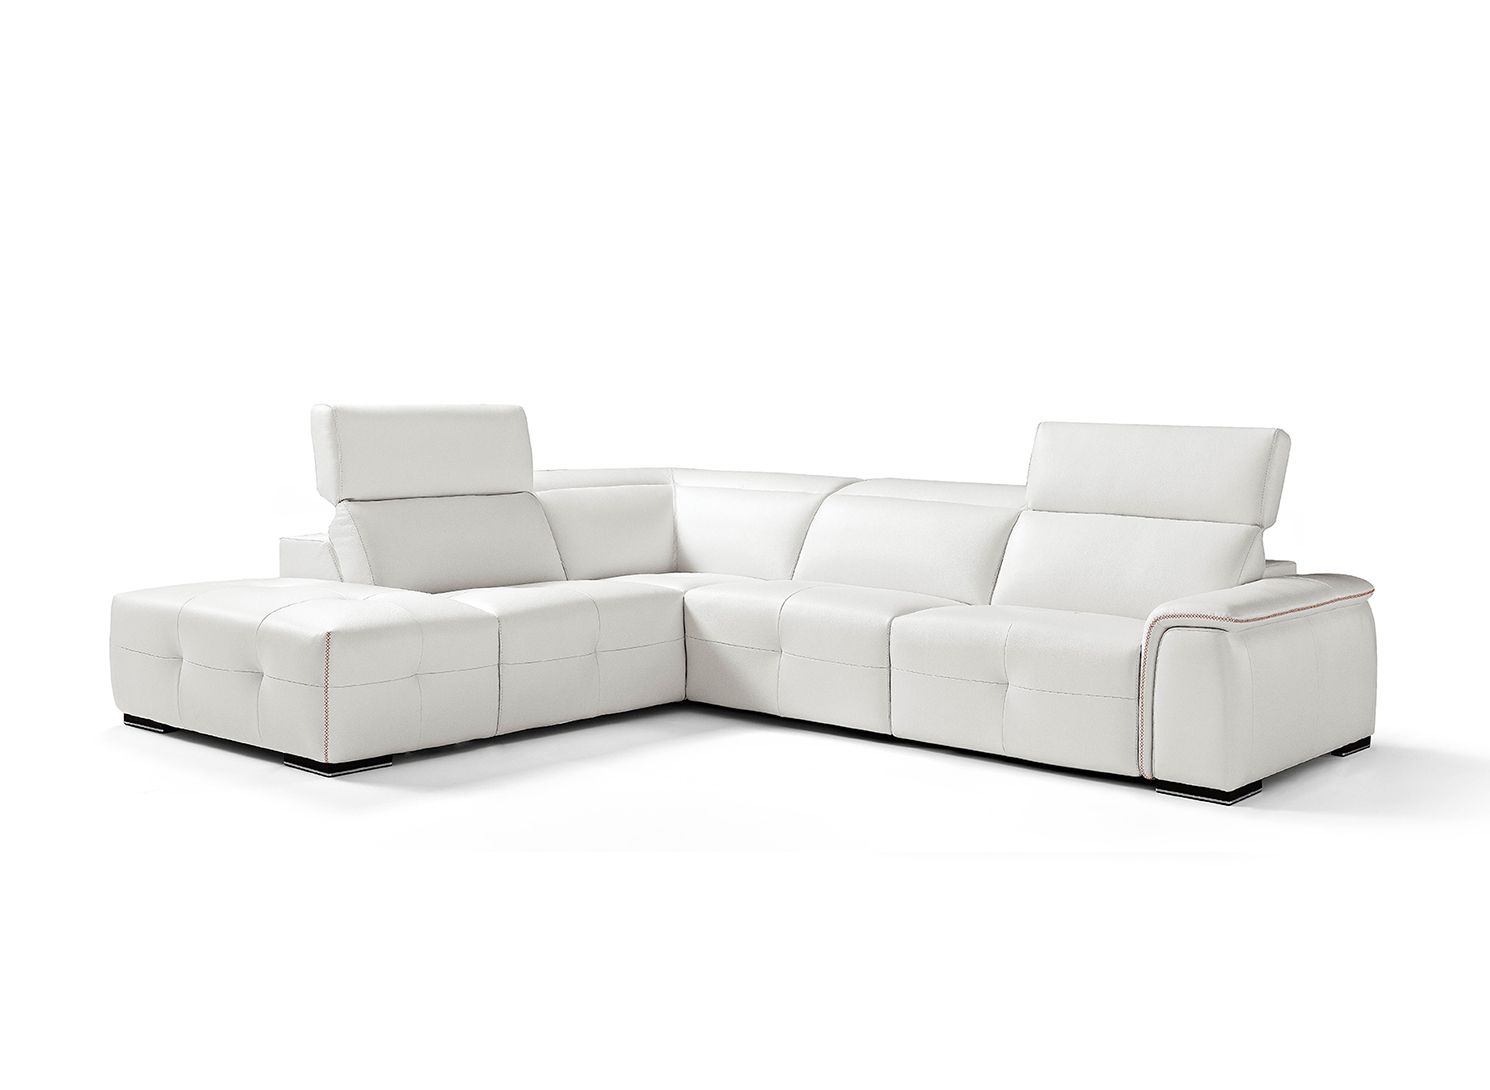 mayon-max-divani-contemporary-collection